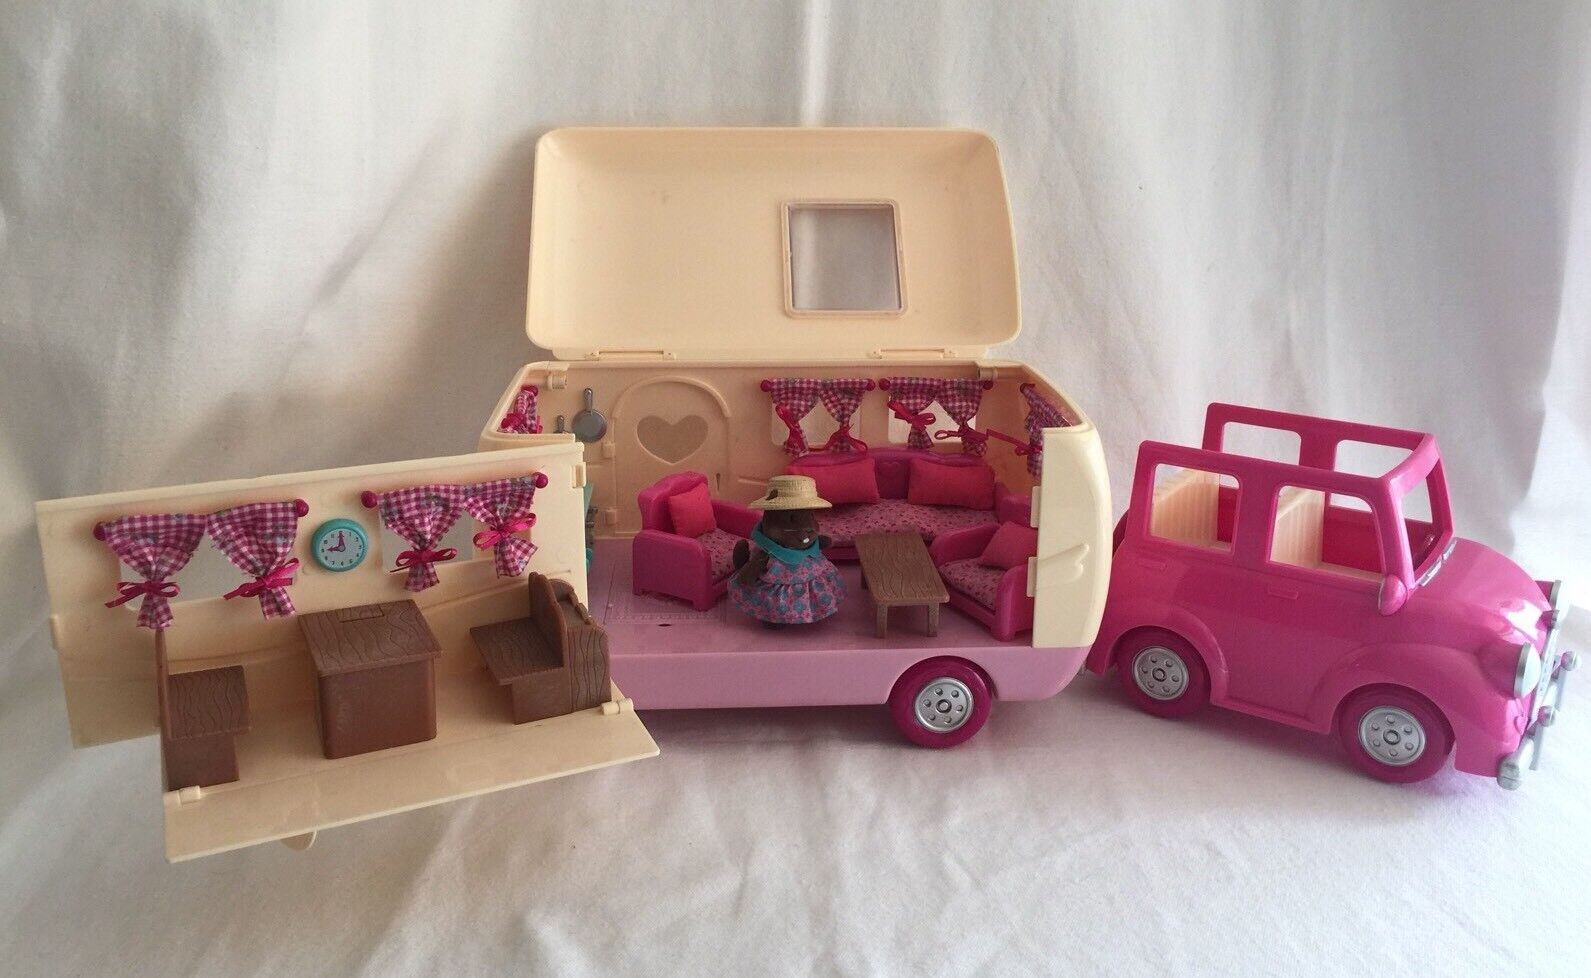 Li'l Woodzeez Happy Camper Car & Accessories Animals Figures